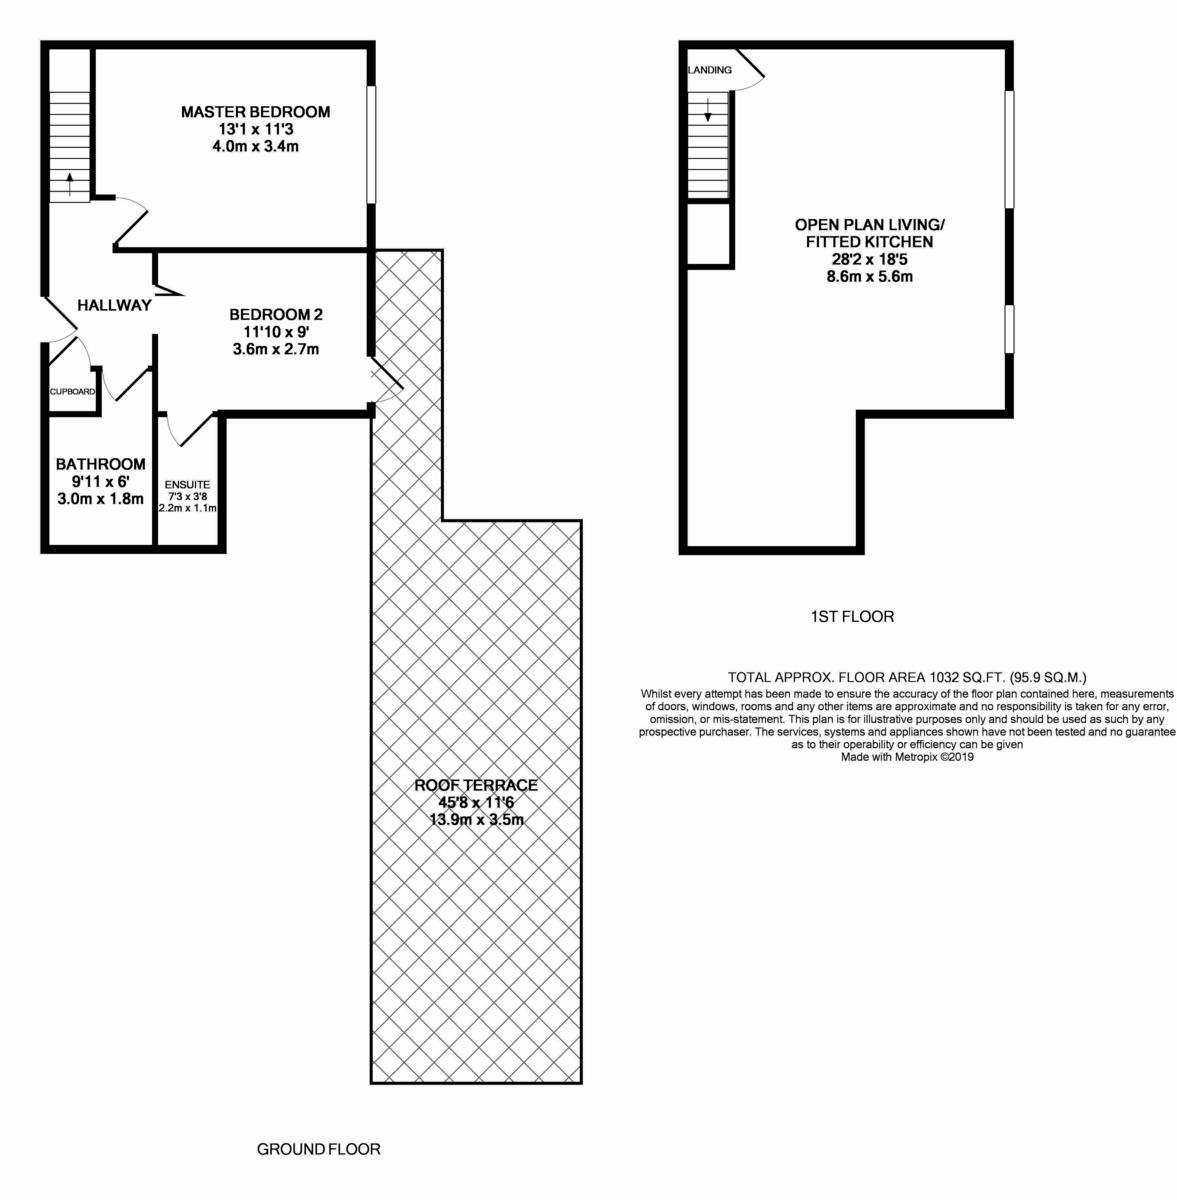 17 Ludgate Hill floorplan 1 of 1